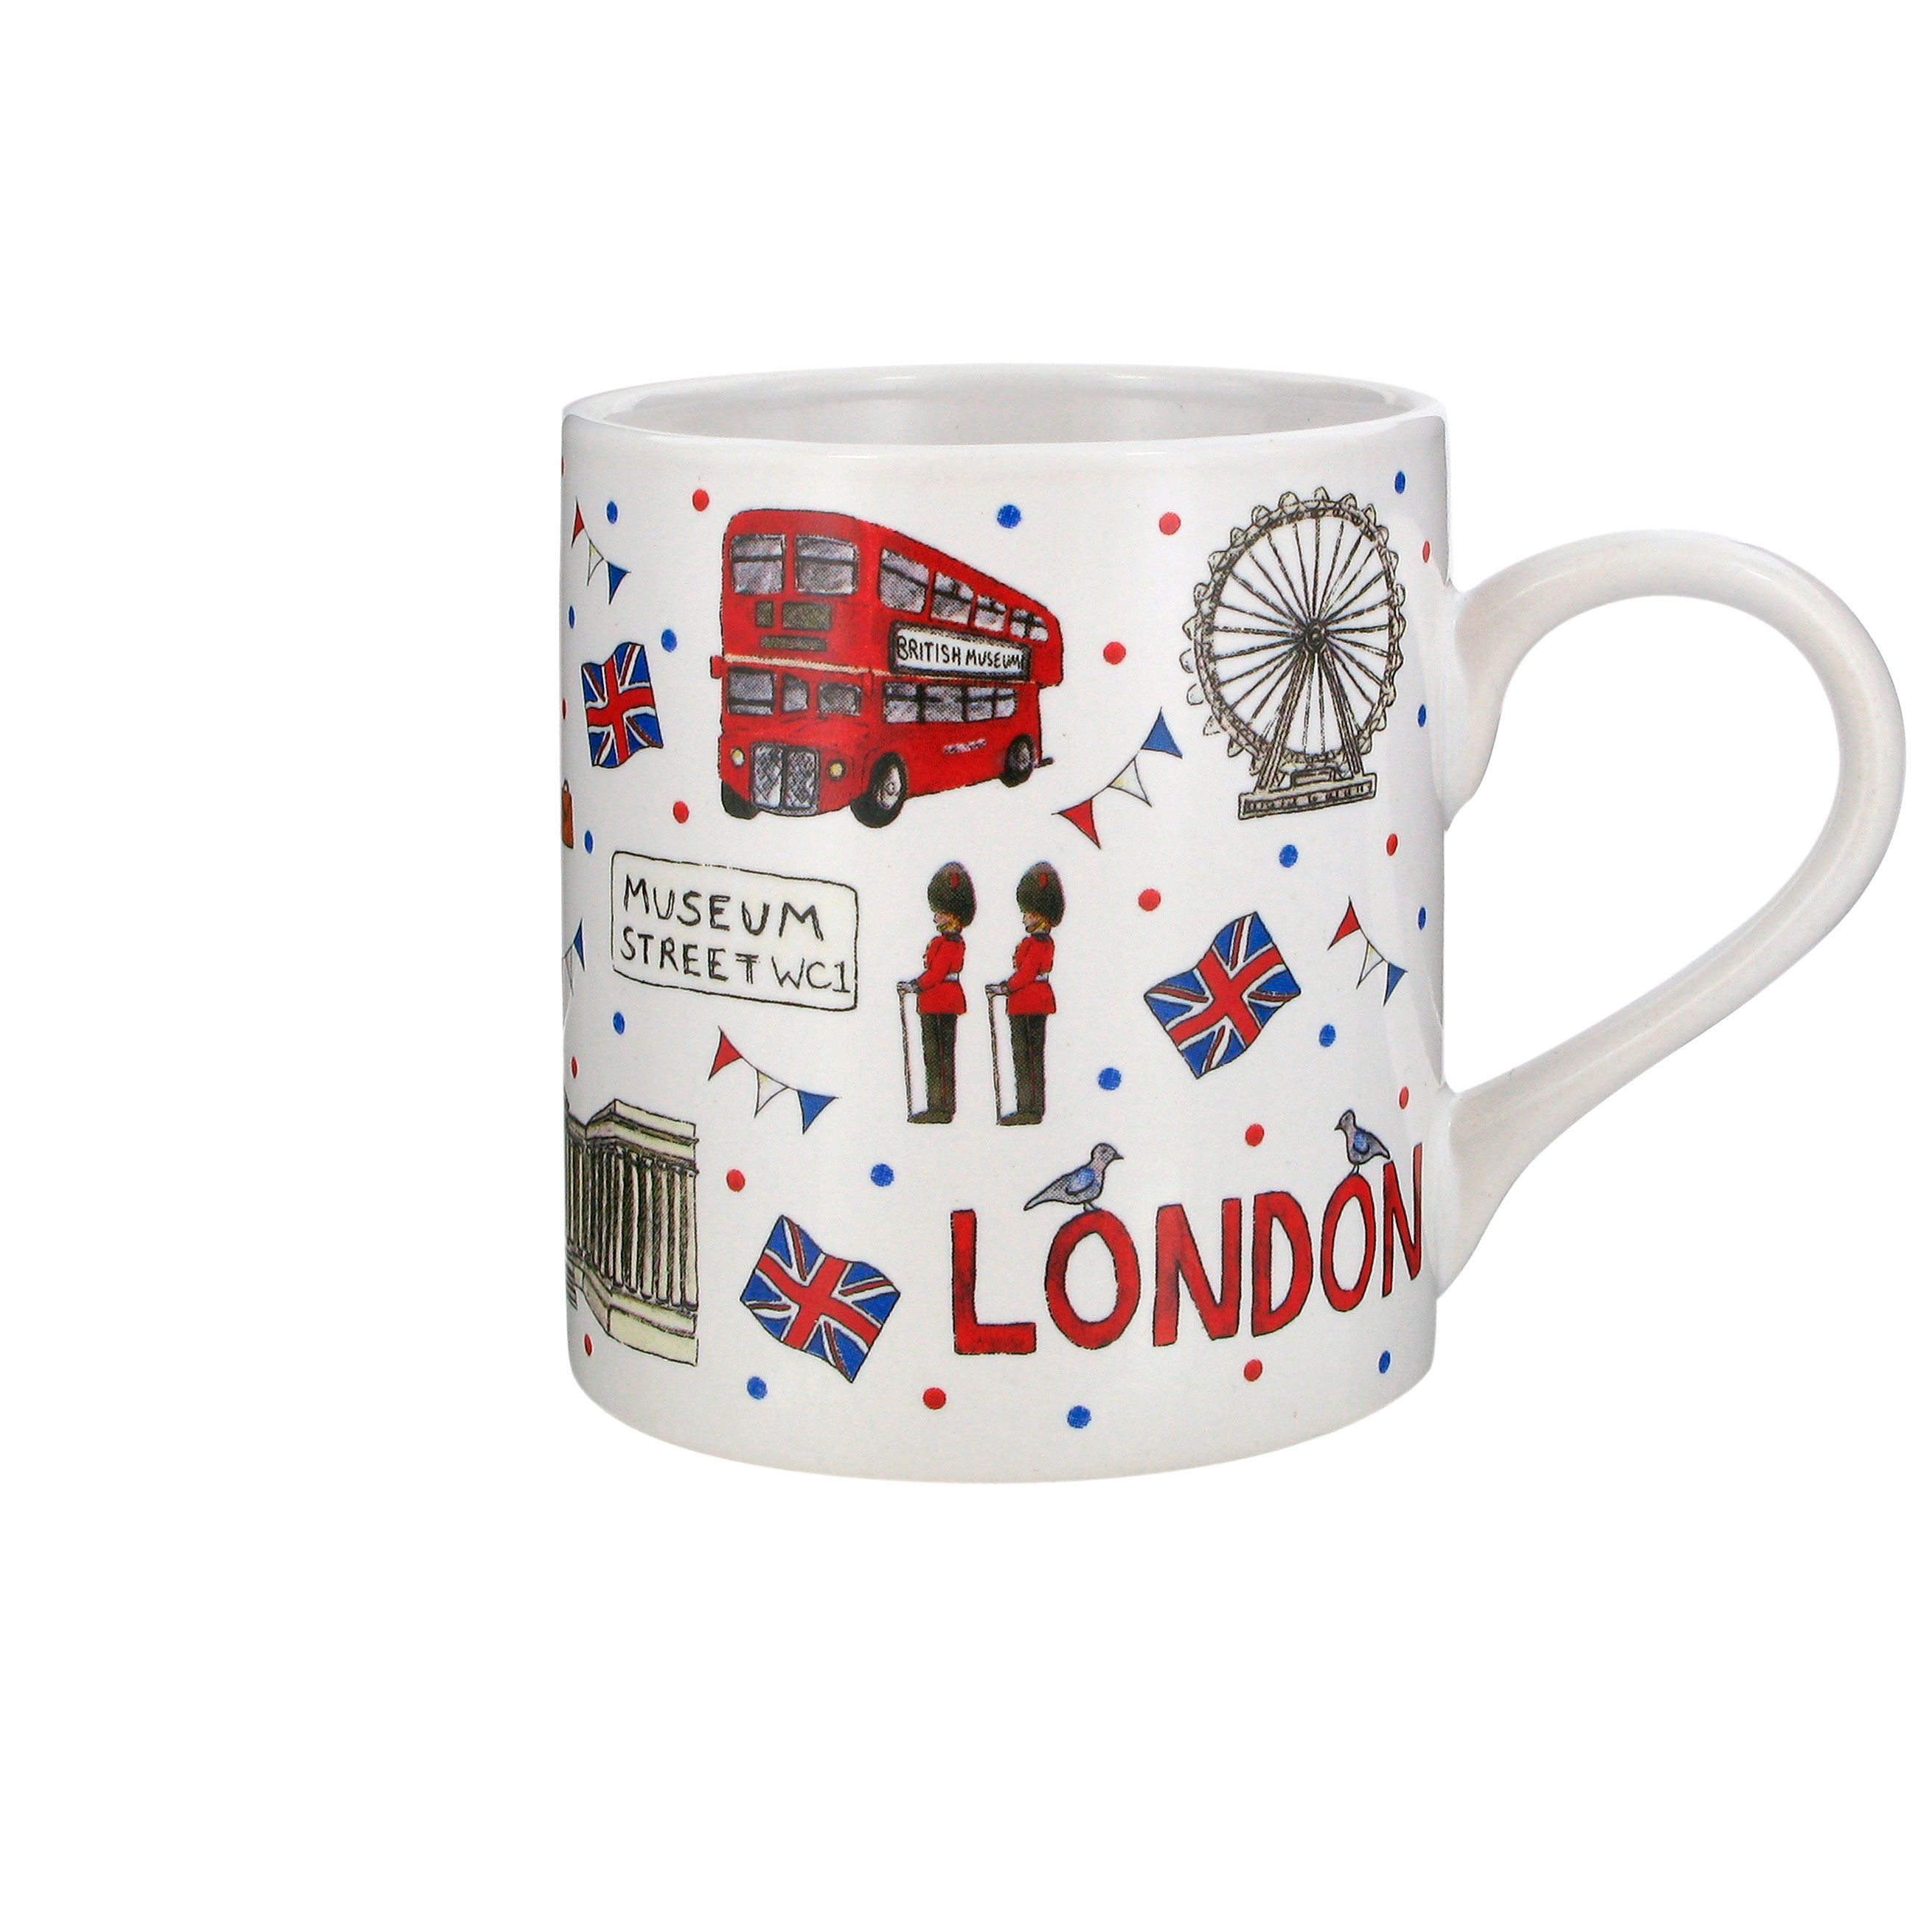 london-white-spot-mug-milly-green-british-museum-exclusive-cmck55790_master